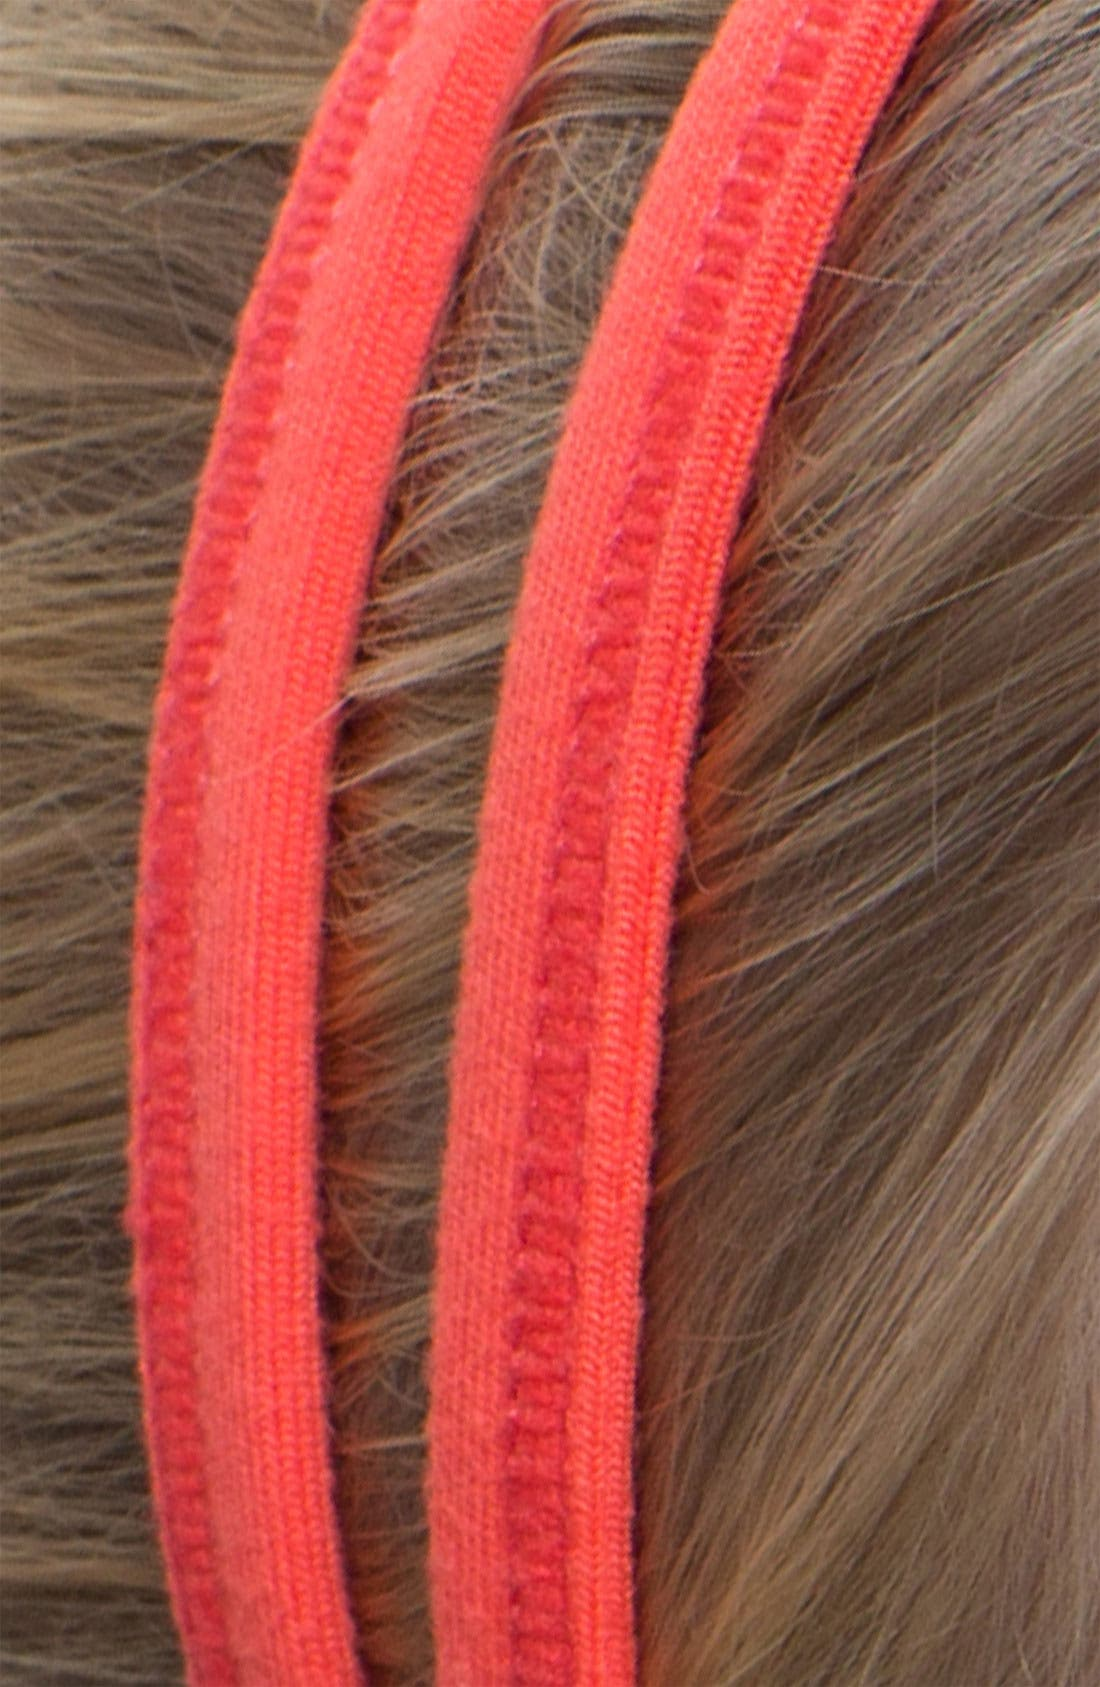 'Double the Fun' Headband,                             Alternate thumbnail 115, color,